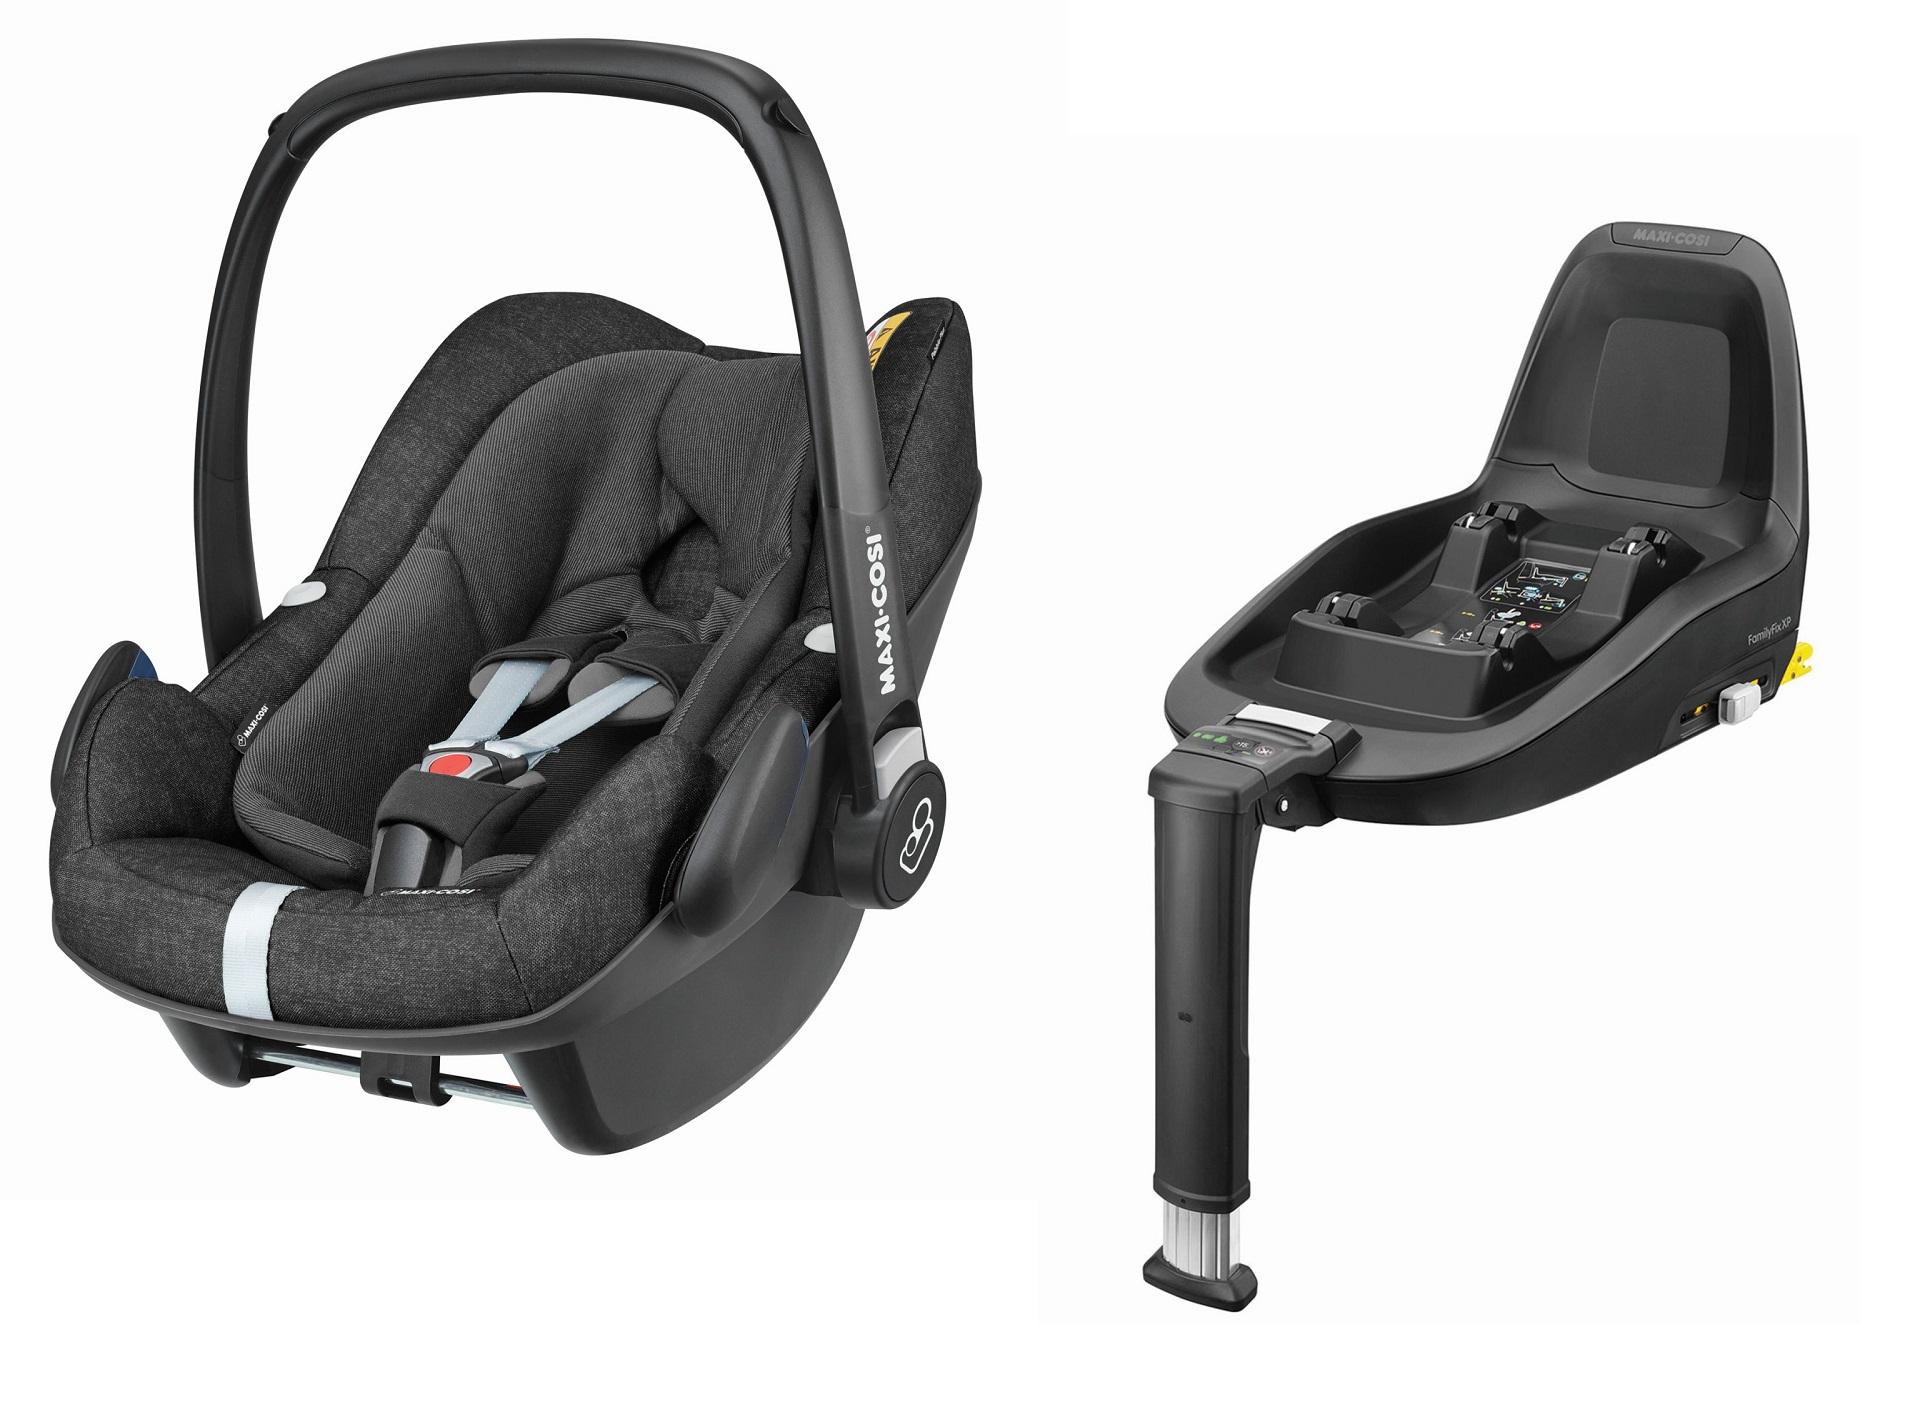 maxi cosi babyschale pebble plus inkl 2way fix 2019 nomad black online kaufen bei kidsroom. Black Bedroom Furniture Sets. Home Design Ideas